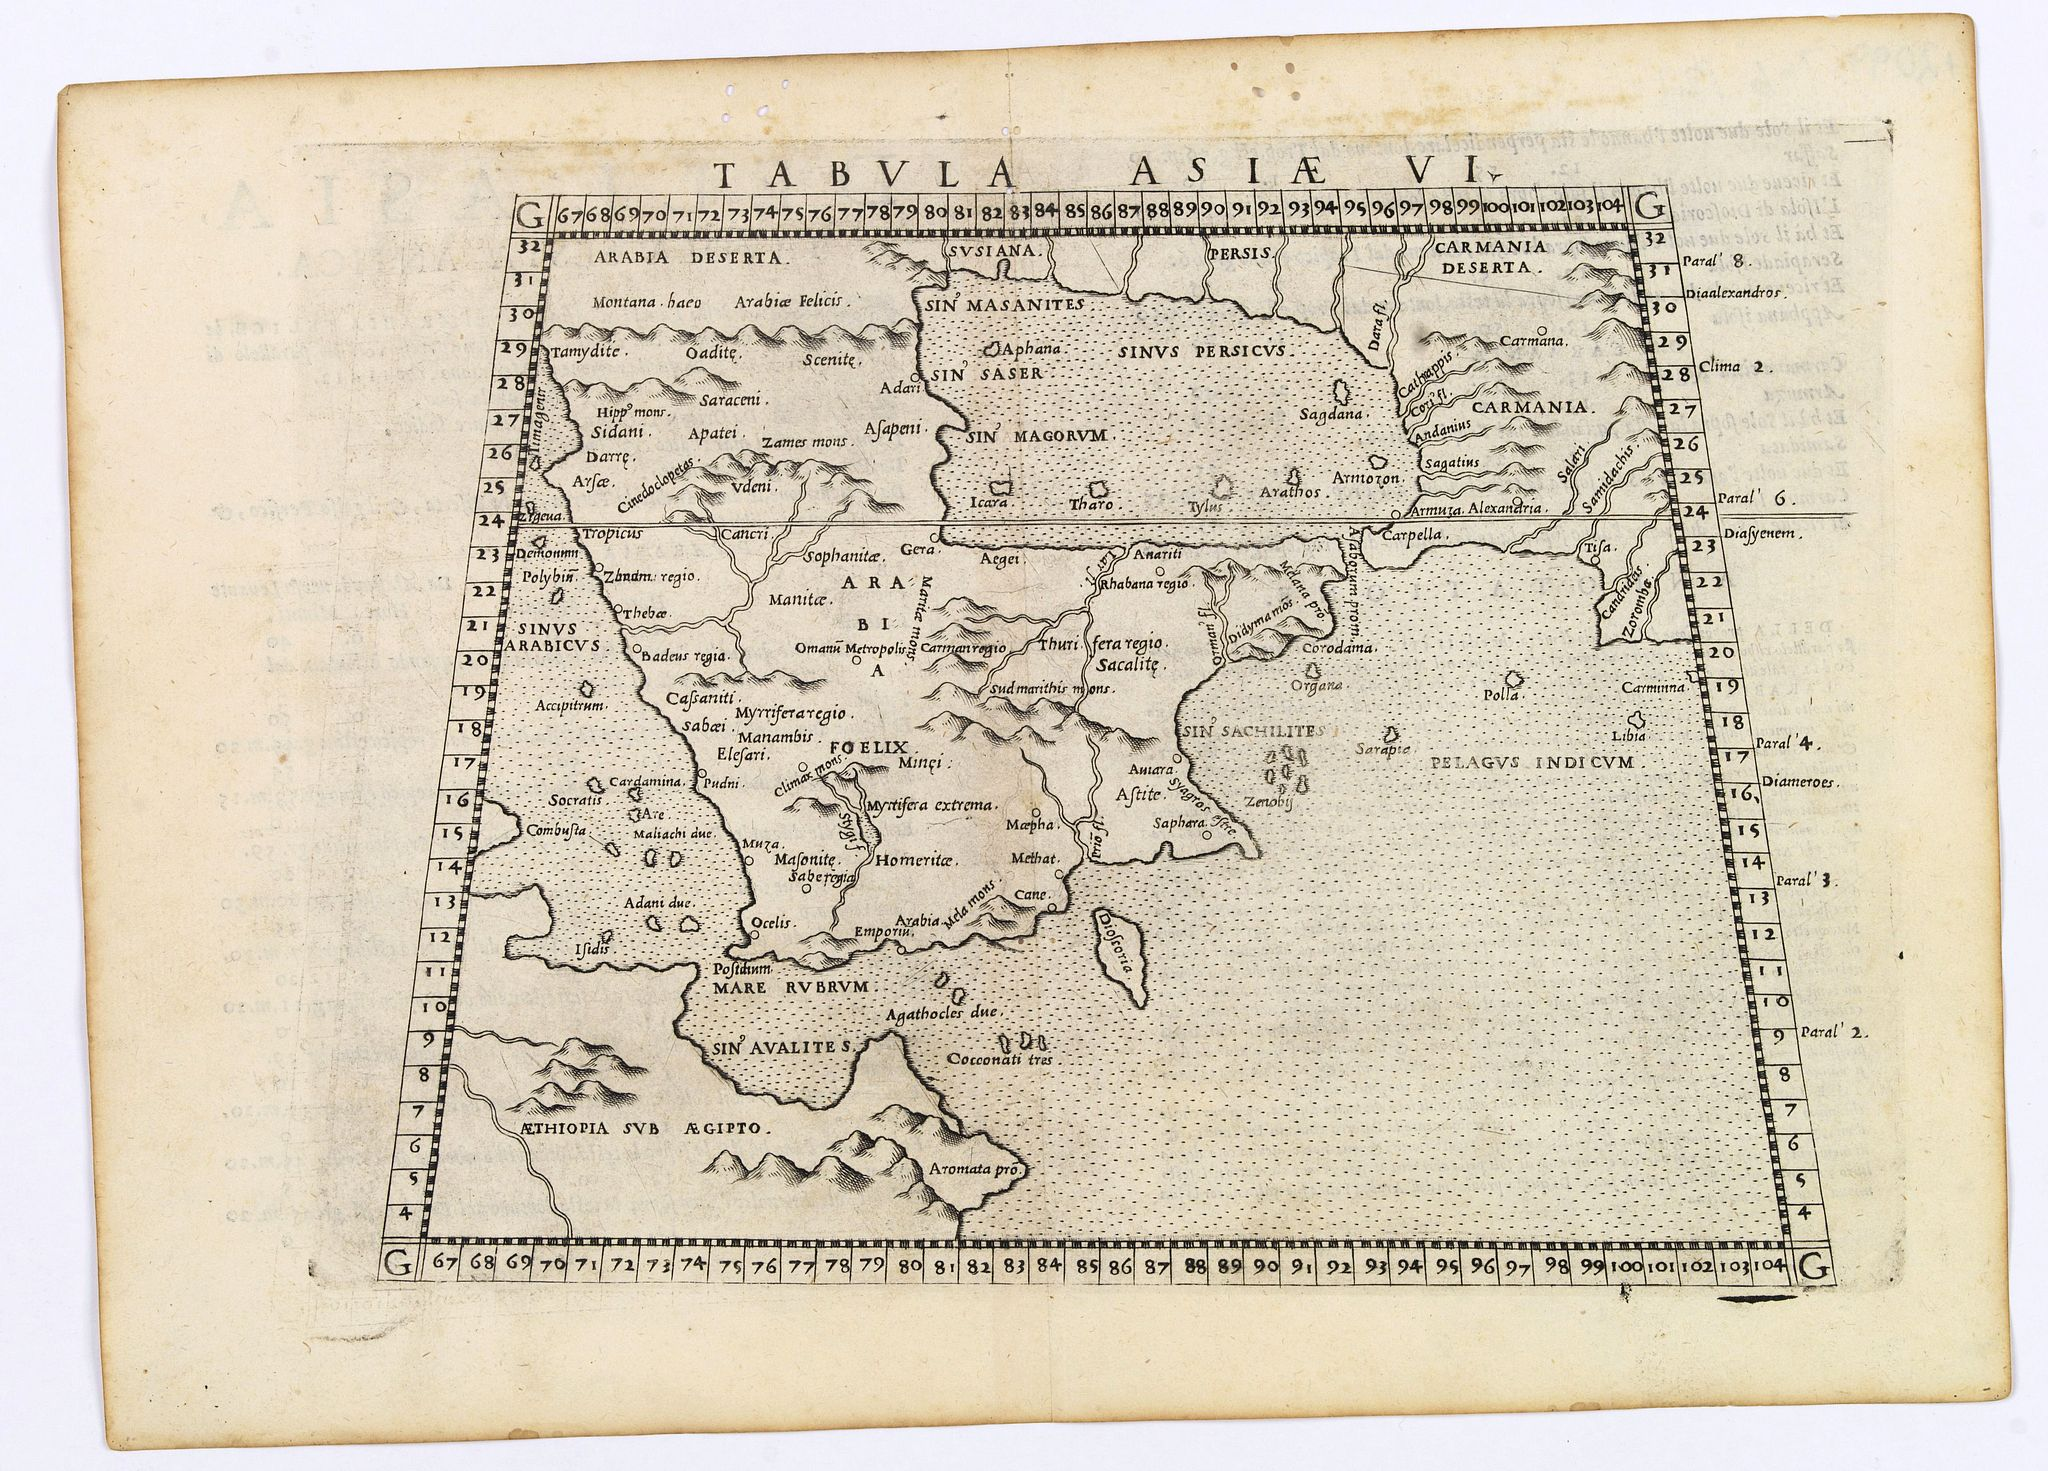 RUSCELLI, G. - Tabula Asiae VI. (Arabian Peninsular)